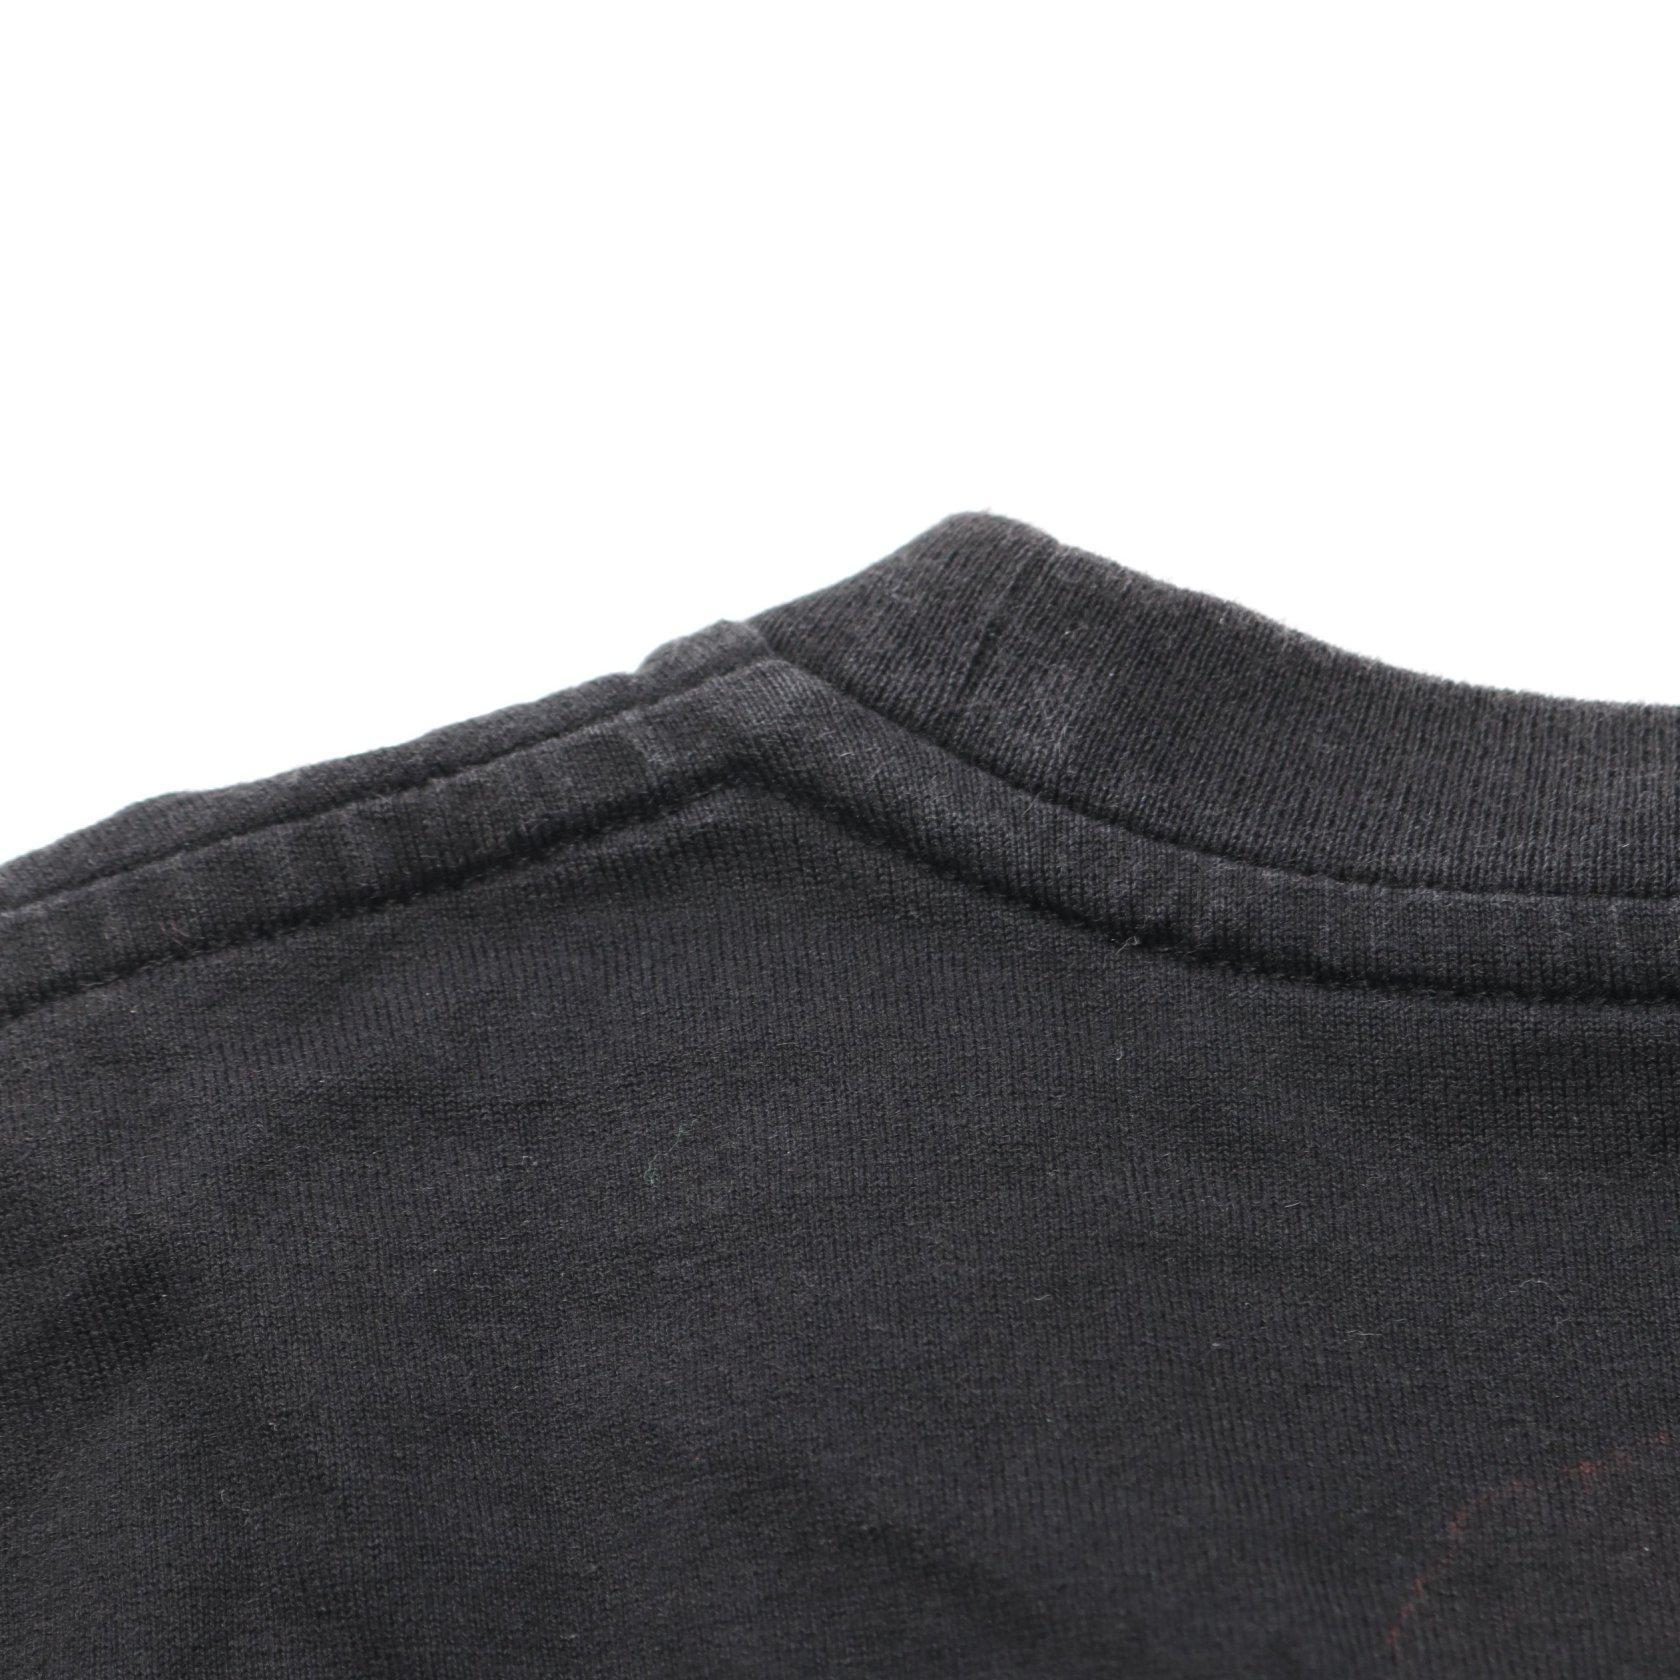 SAINT LAURENT PARIS・トップス・ Tシャツ ブラック ロゴ プリント